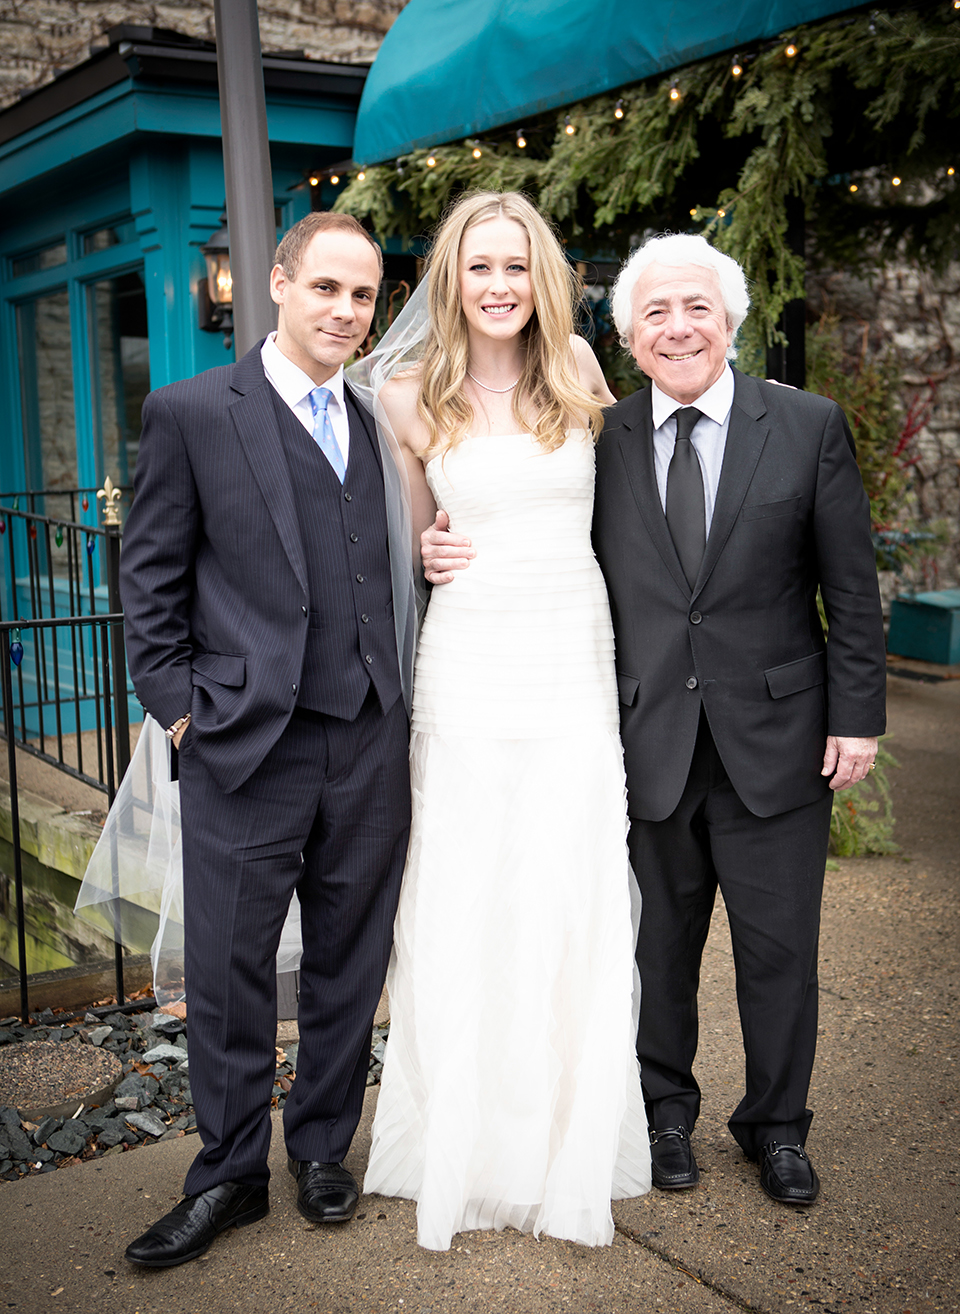 Michael Gittelson, Molly Braun, & Gene Gittelson